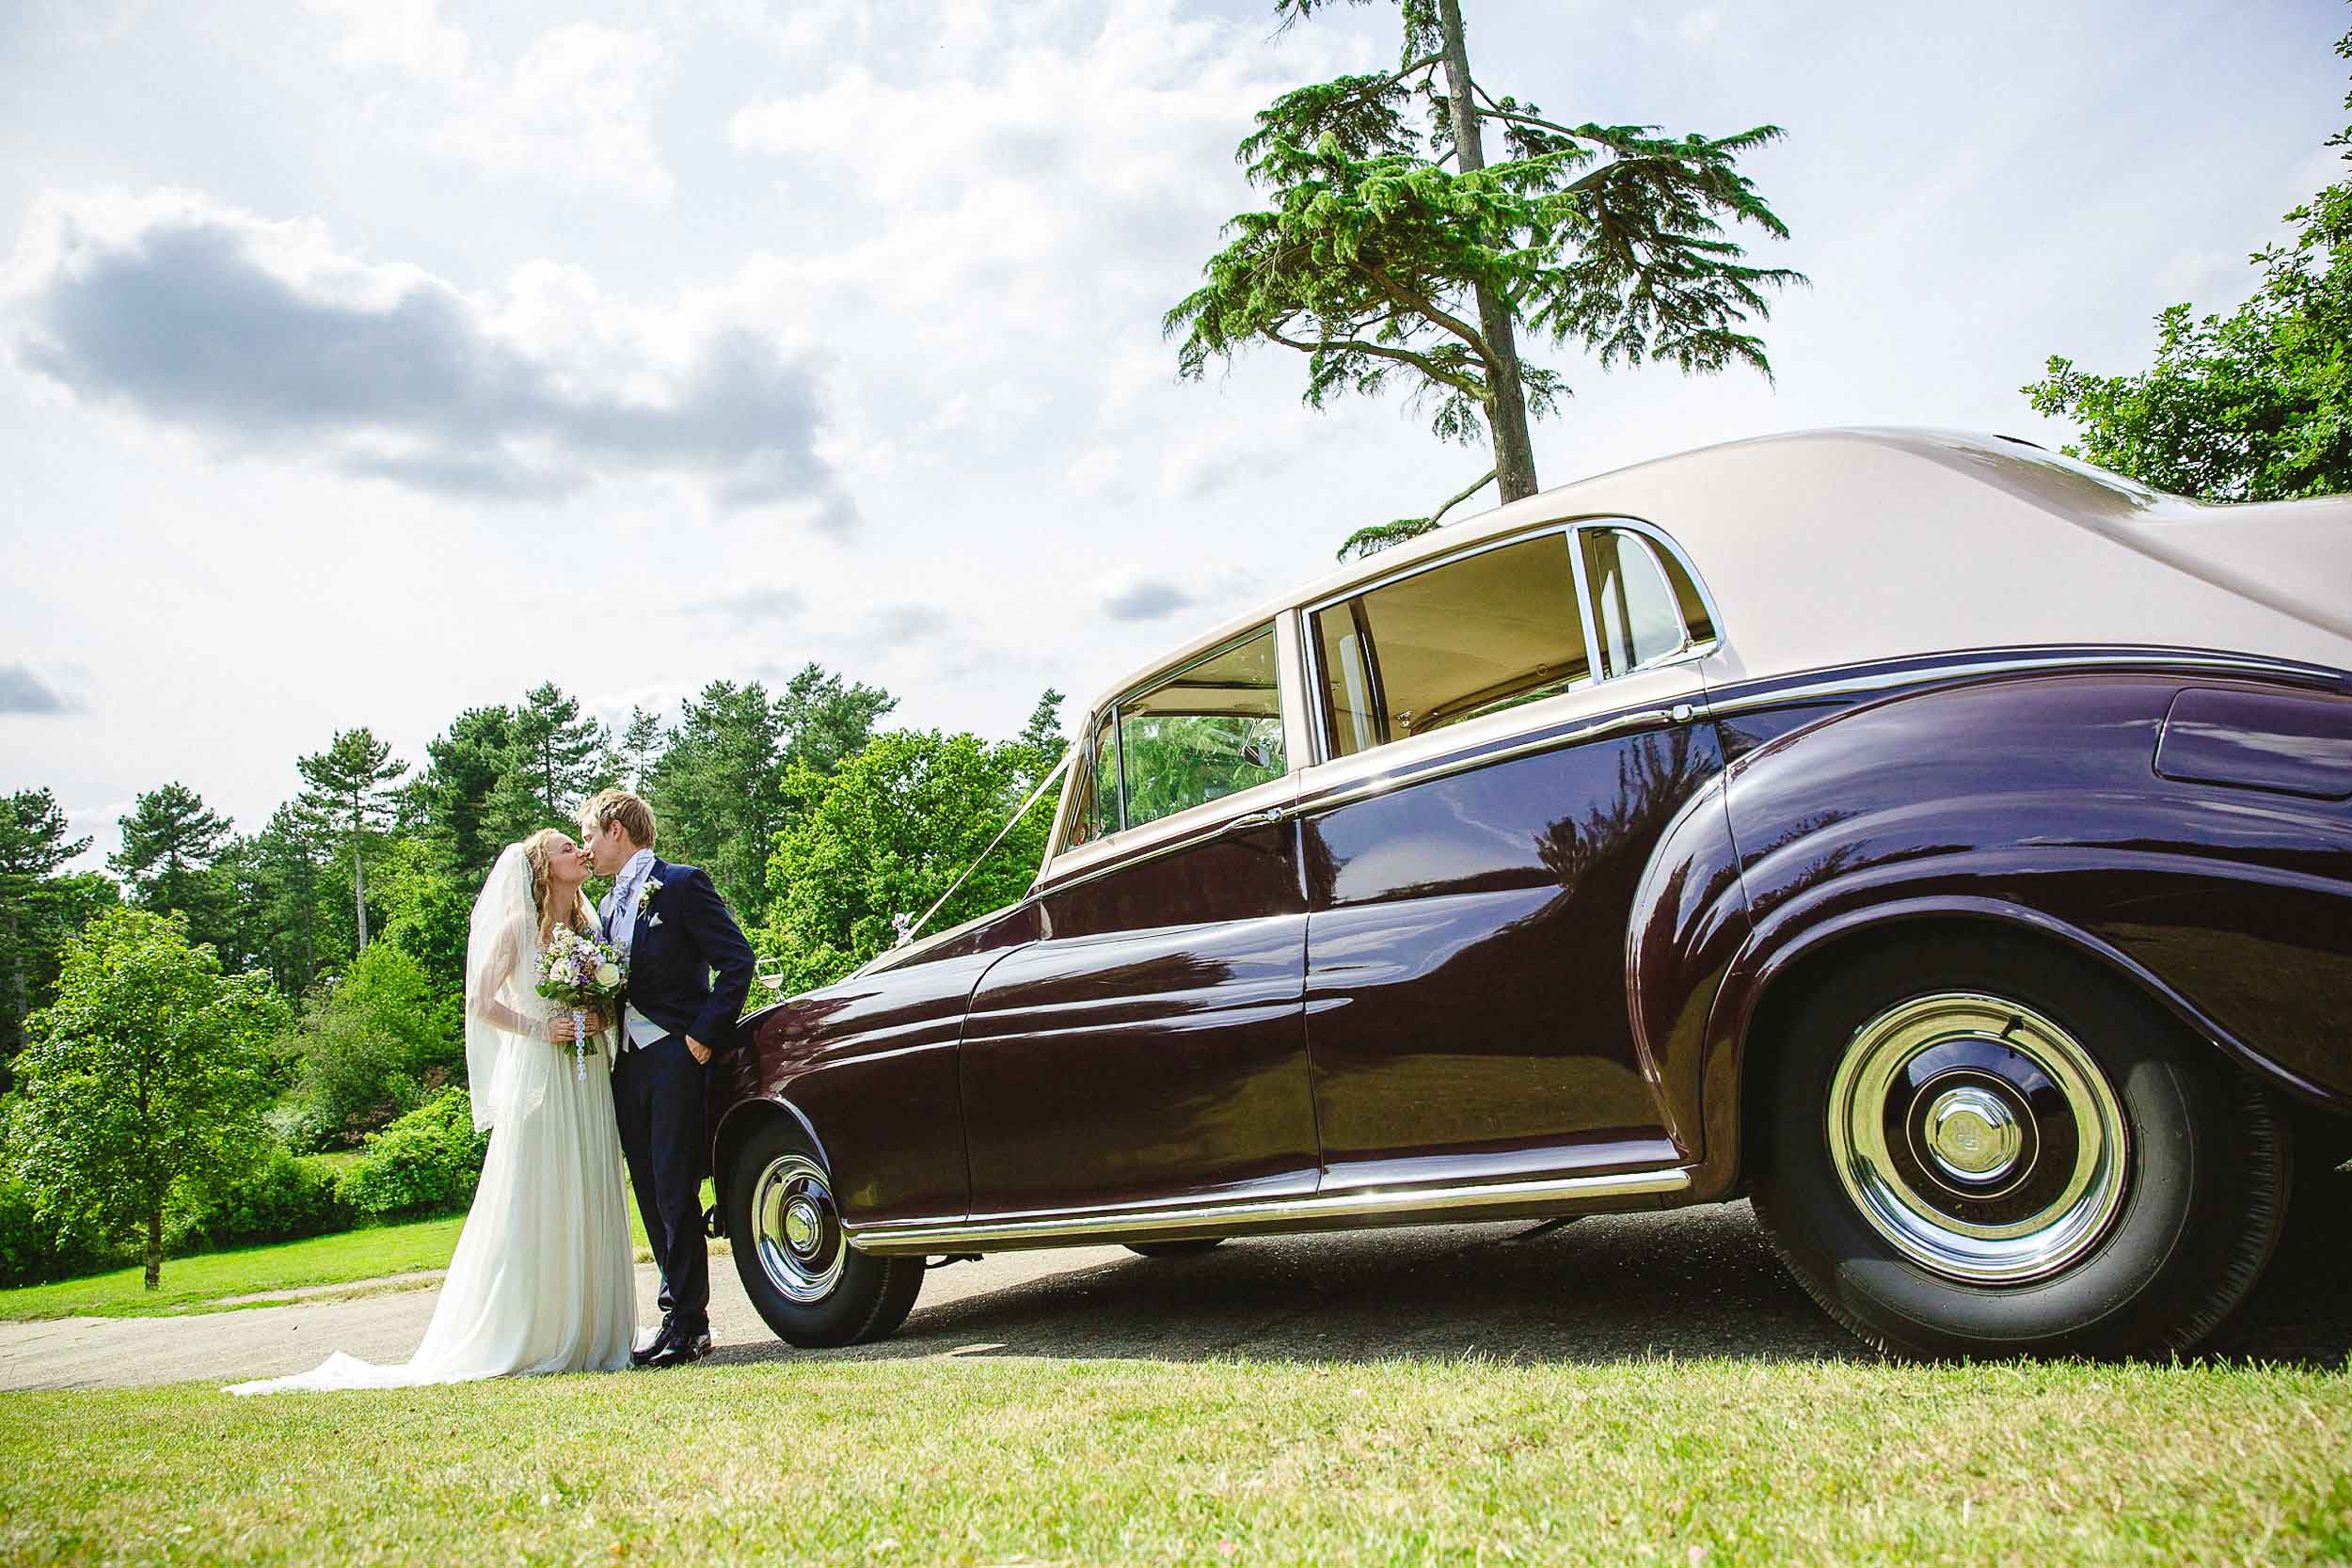 Marks-Hall-Wedding-Photographer-36.jpg